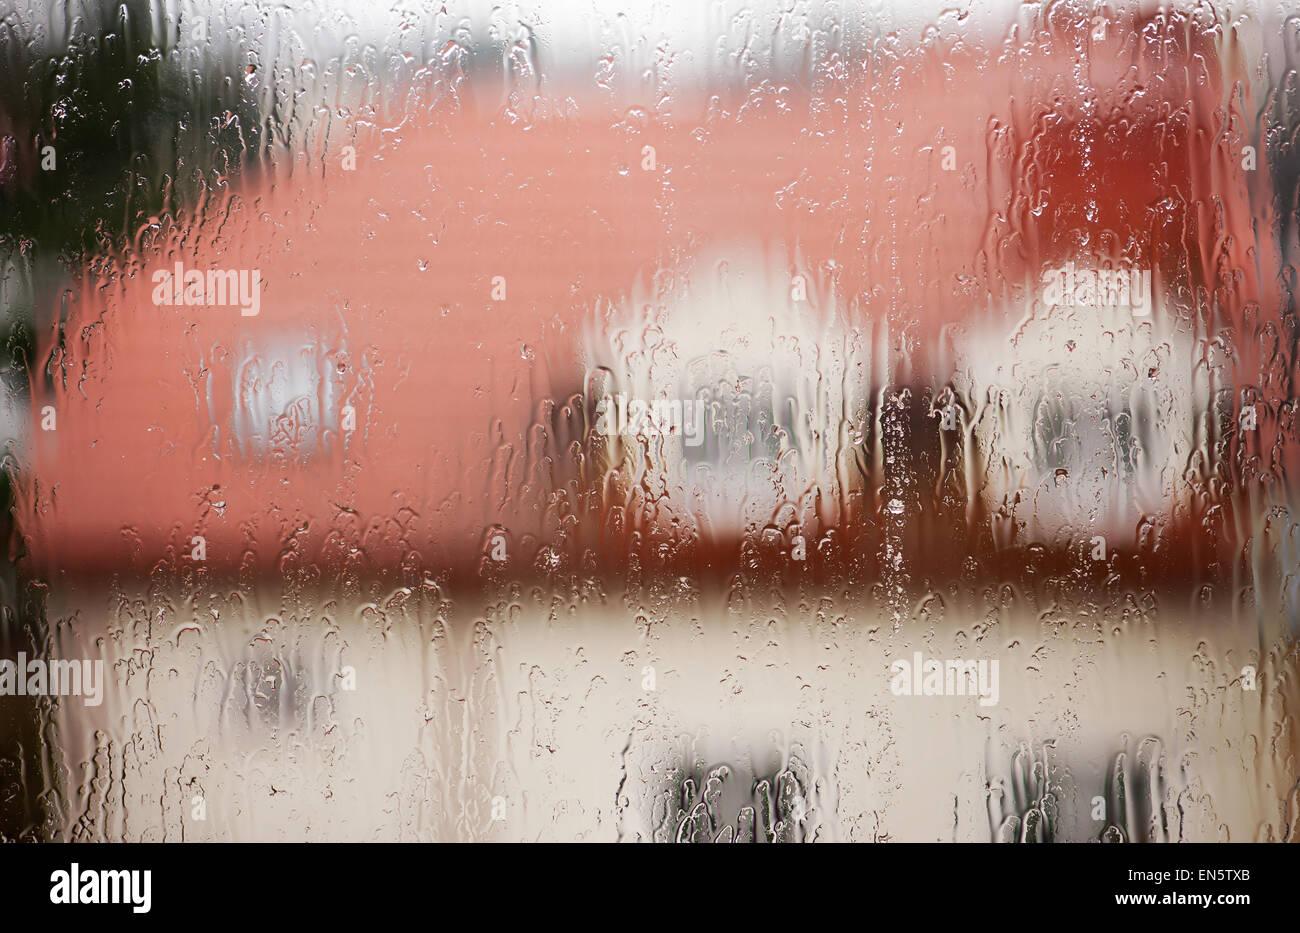 Rainy teary window abstract - Stock Image